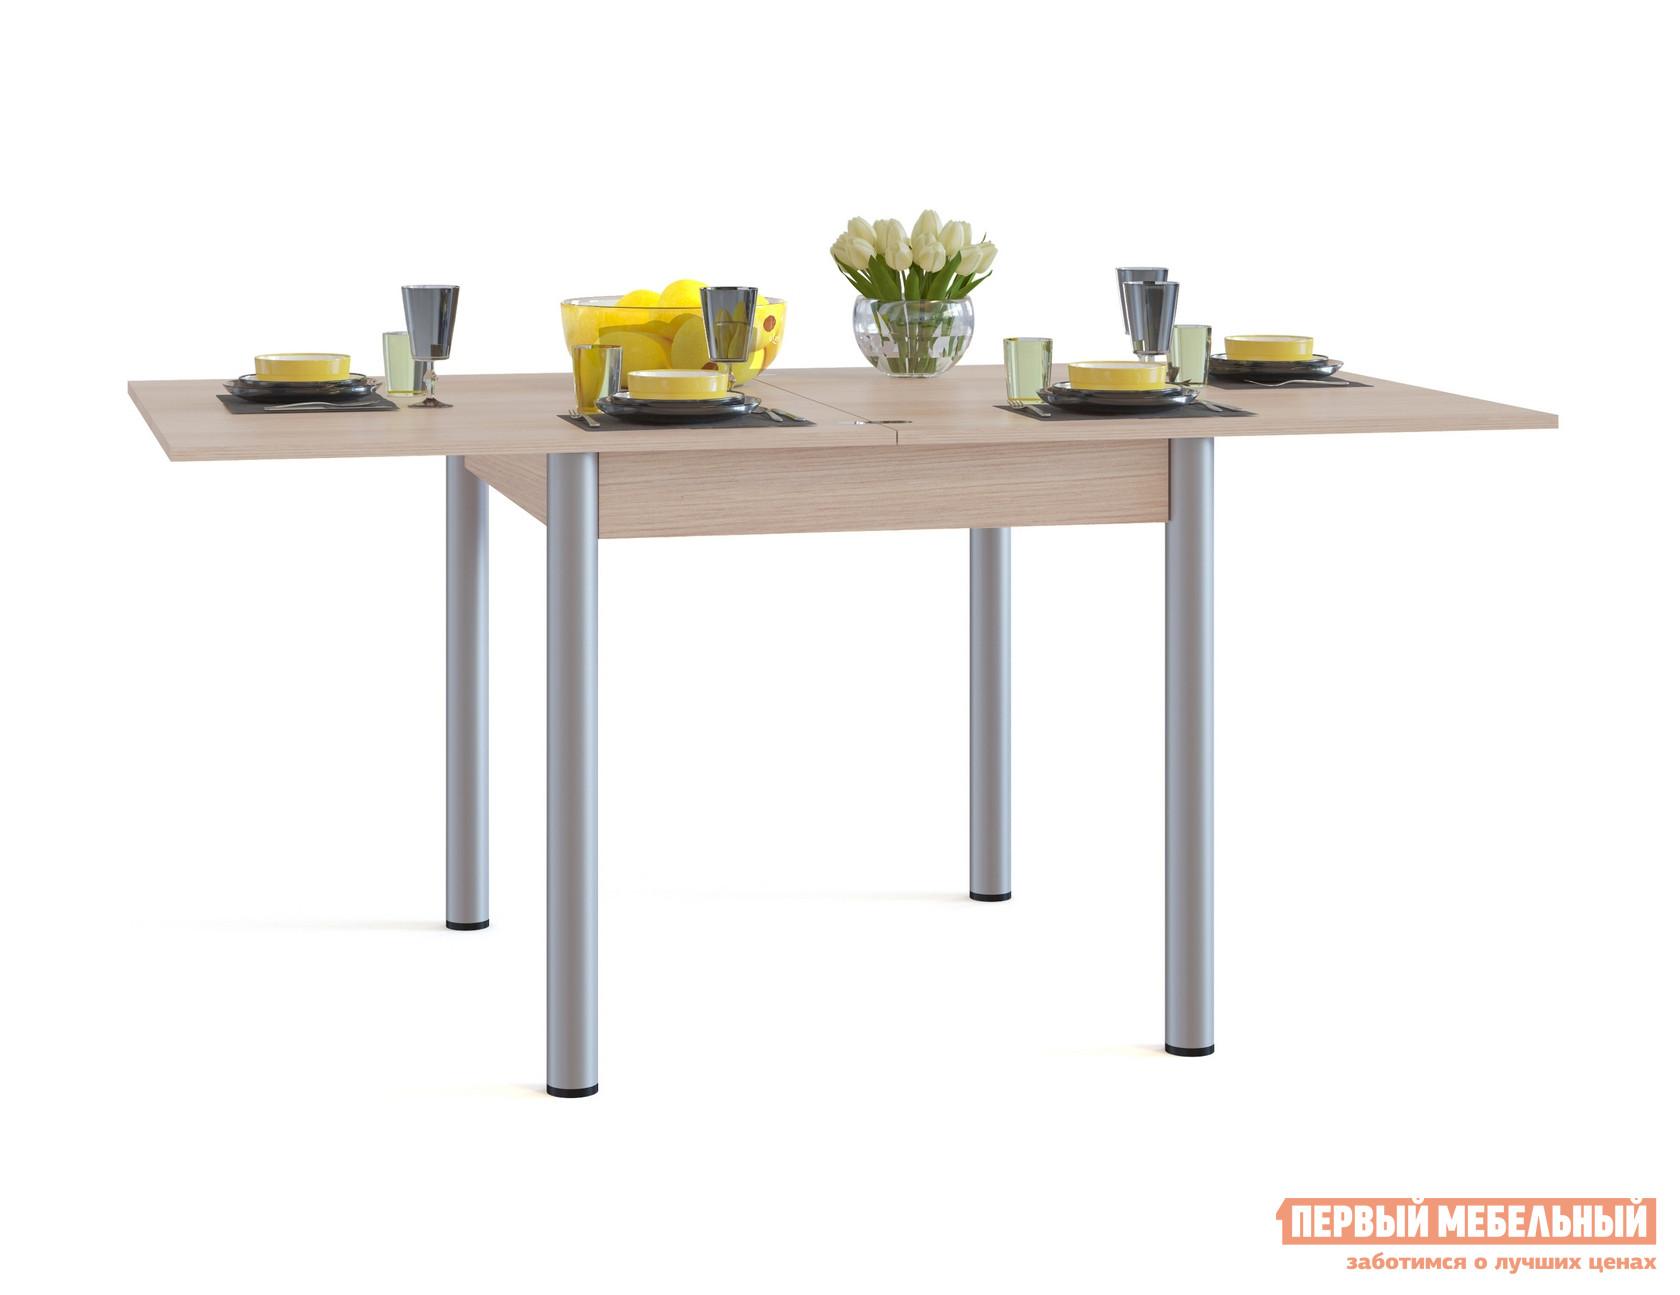 Кухонный стол Сокол СО-2м Беленый дуб